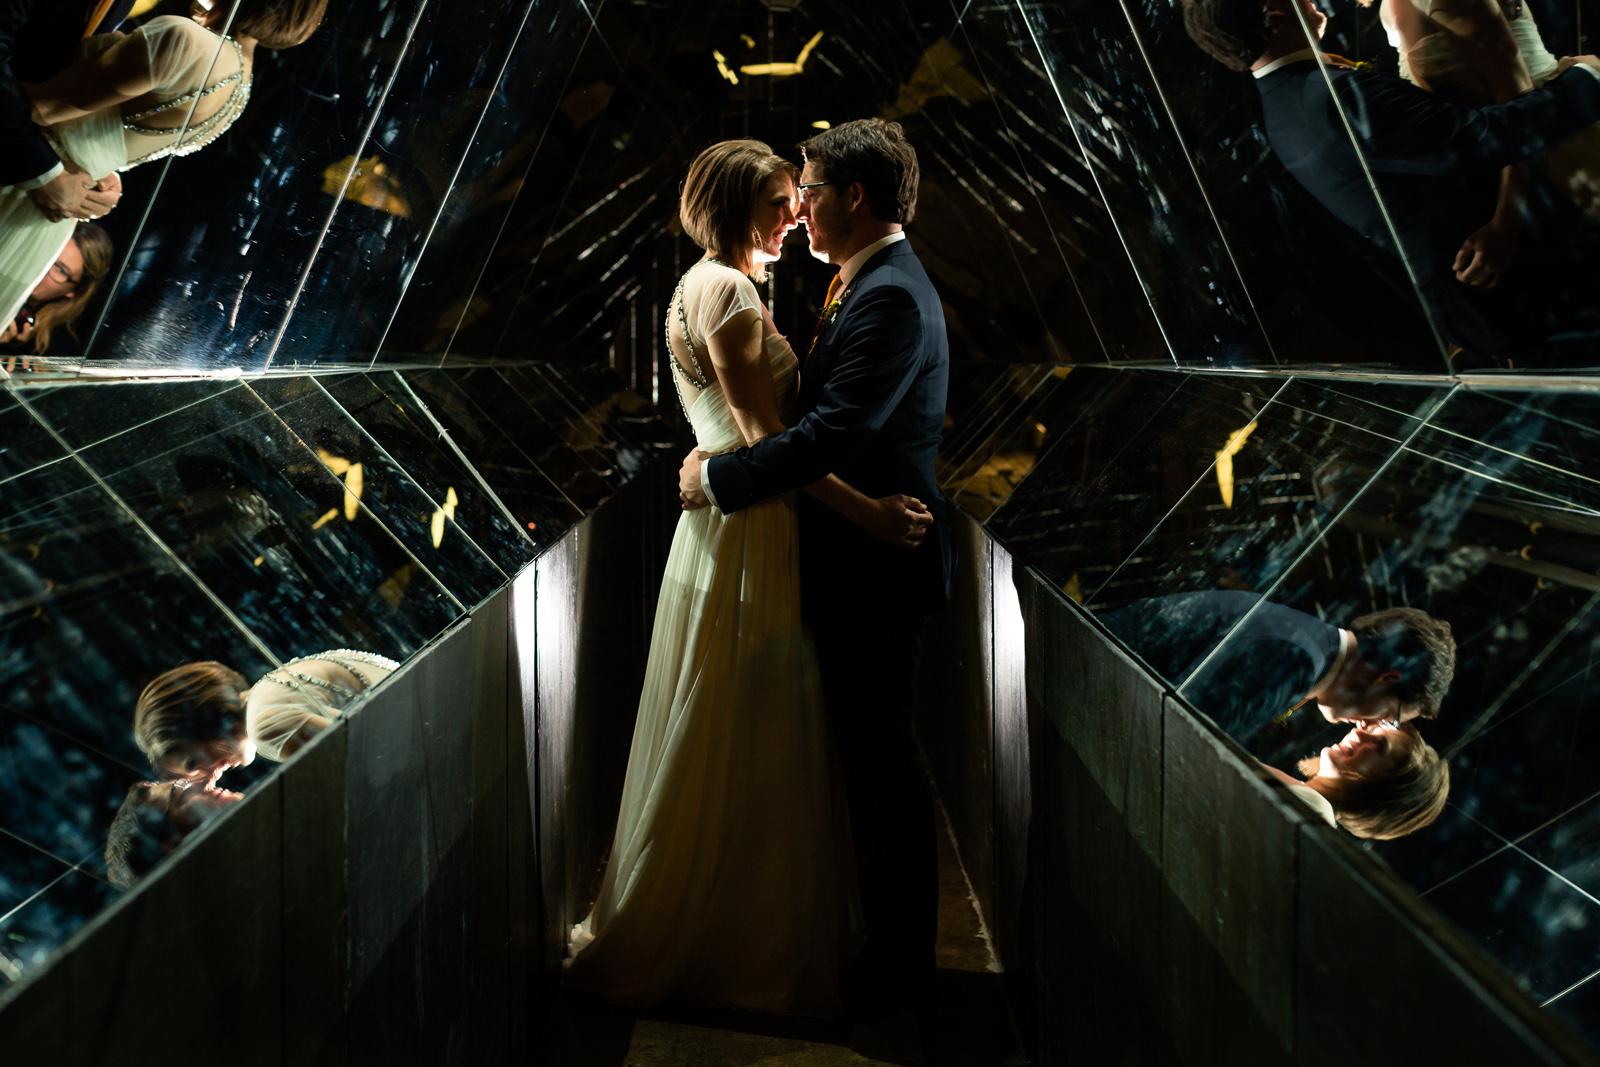 Oldani Photography-St Louis-Wedding Photos-wedding photographer-wedding party-City Museum_20141122_17150824.jpg